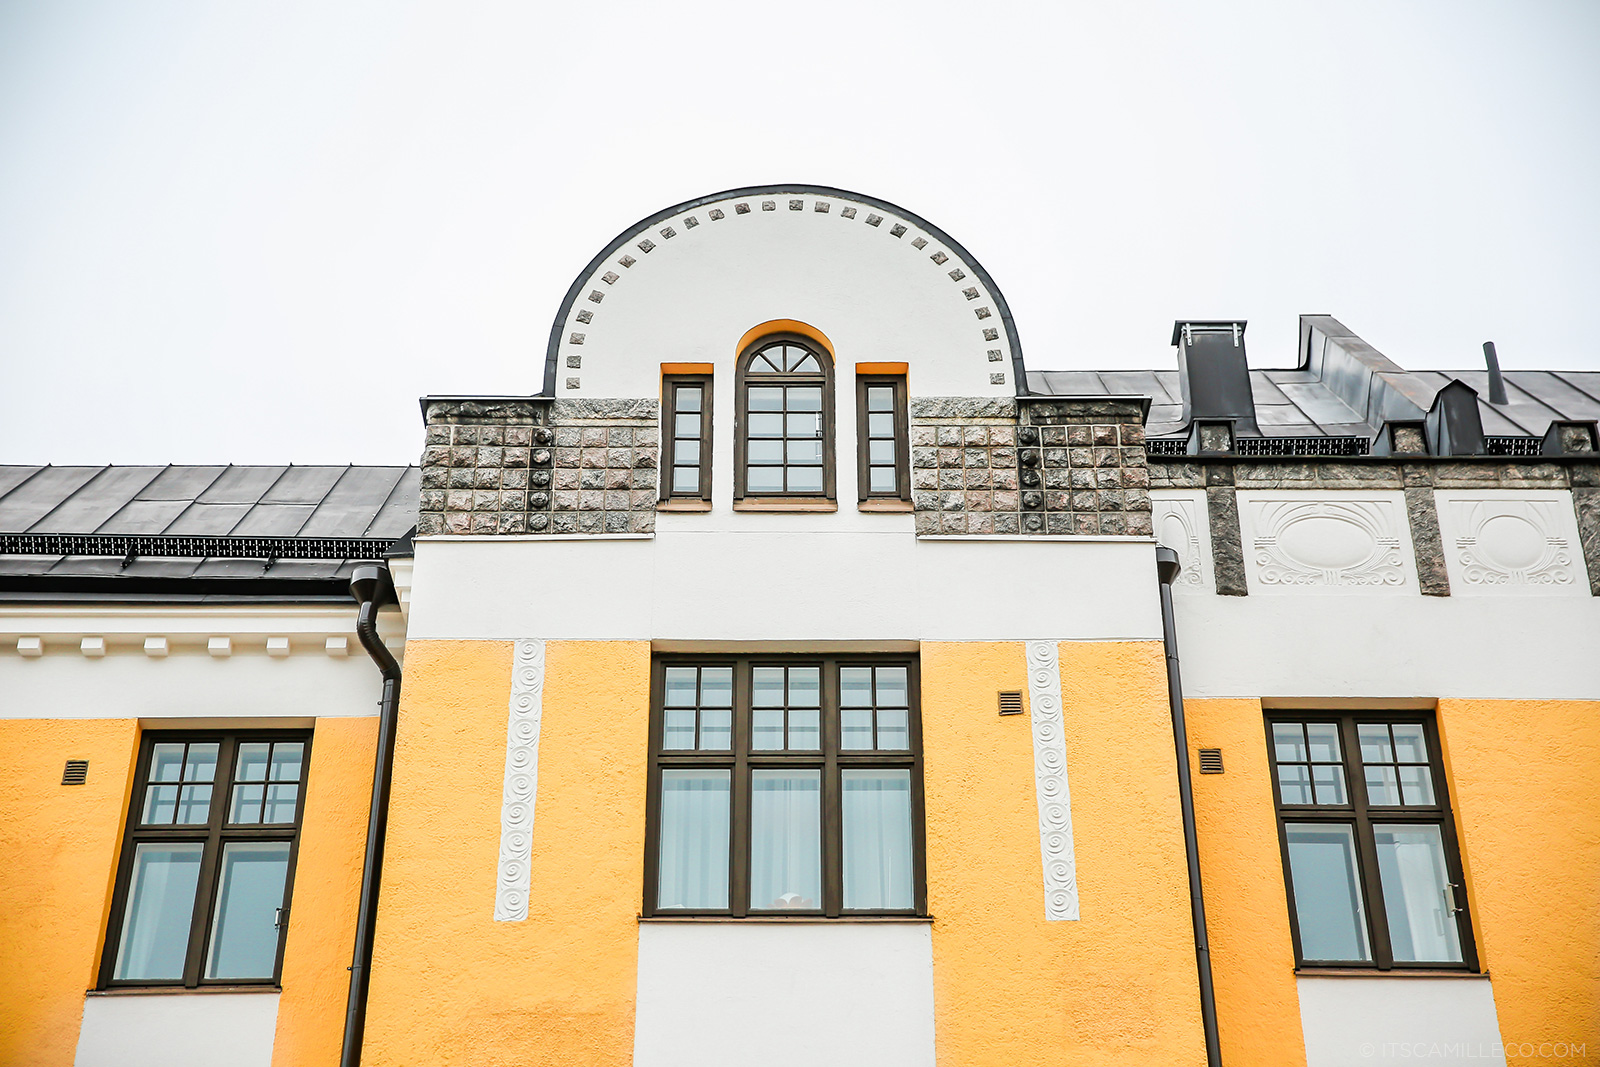 Huvilakatu, Helsinki - www.itscamilleco.com